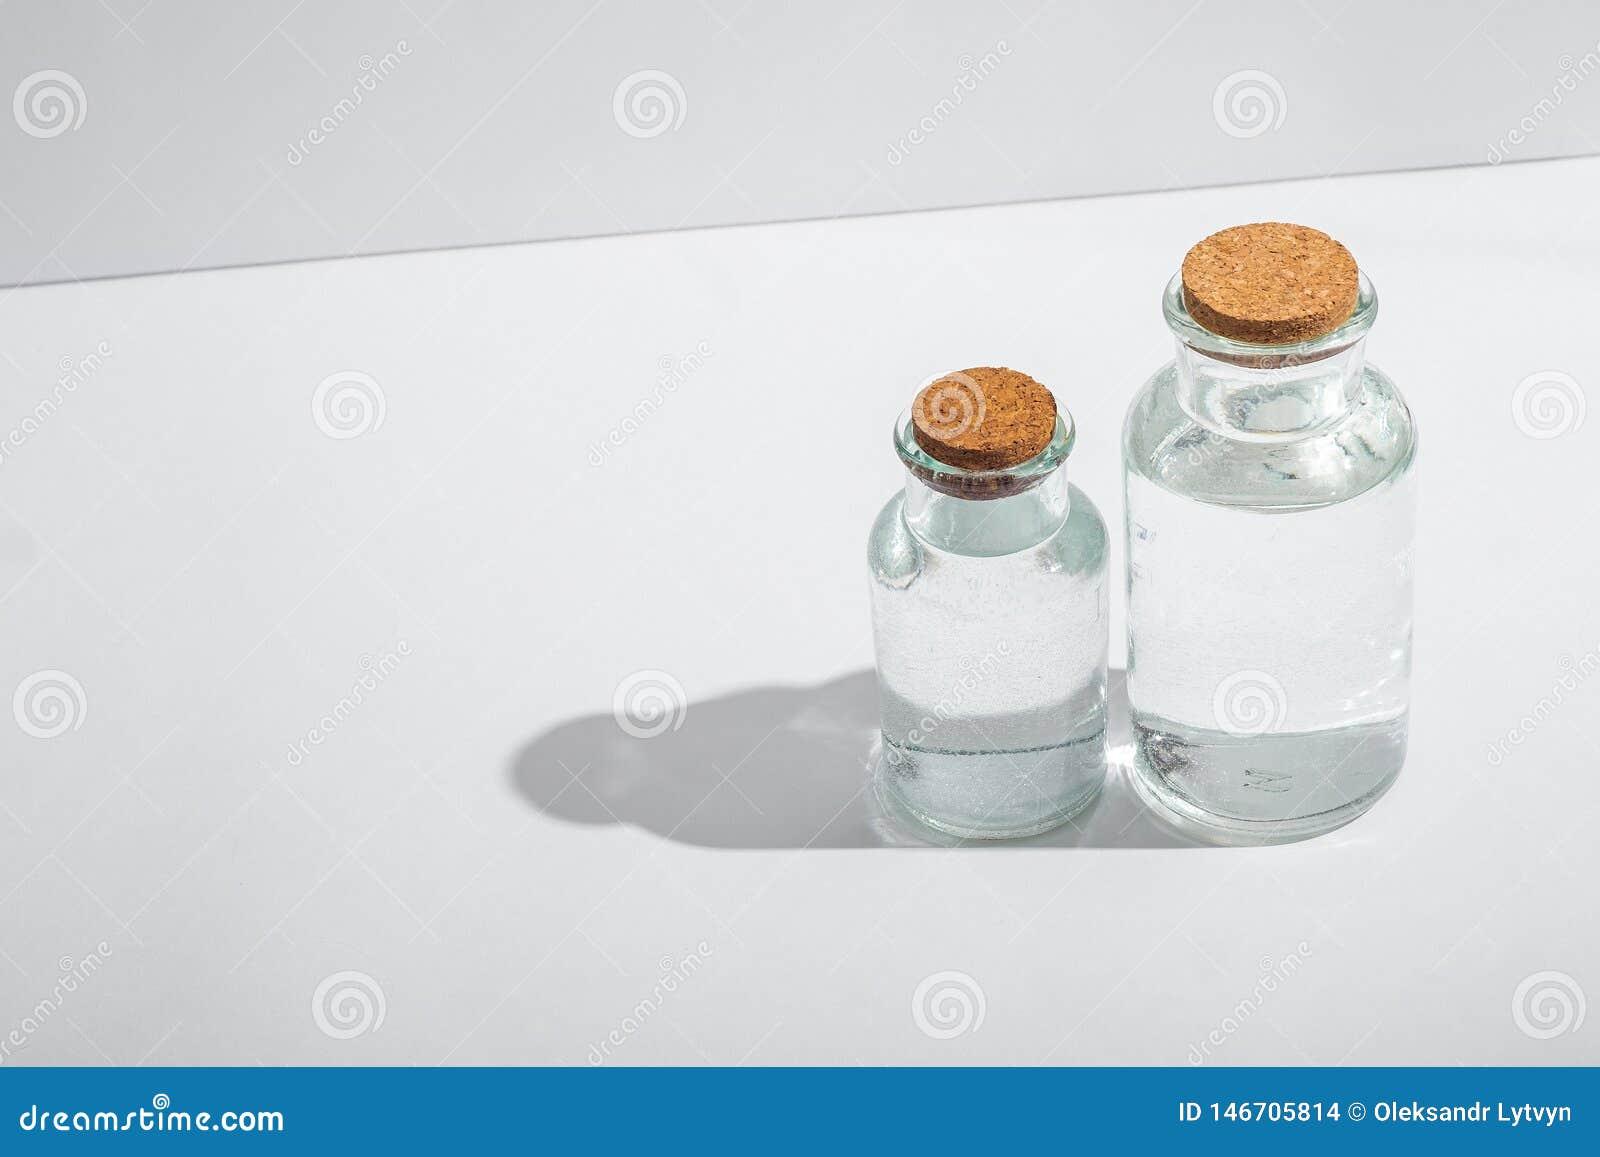 Glasflaskor med korklock på en vit bakgrund